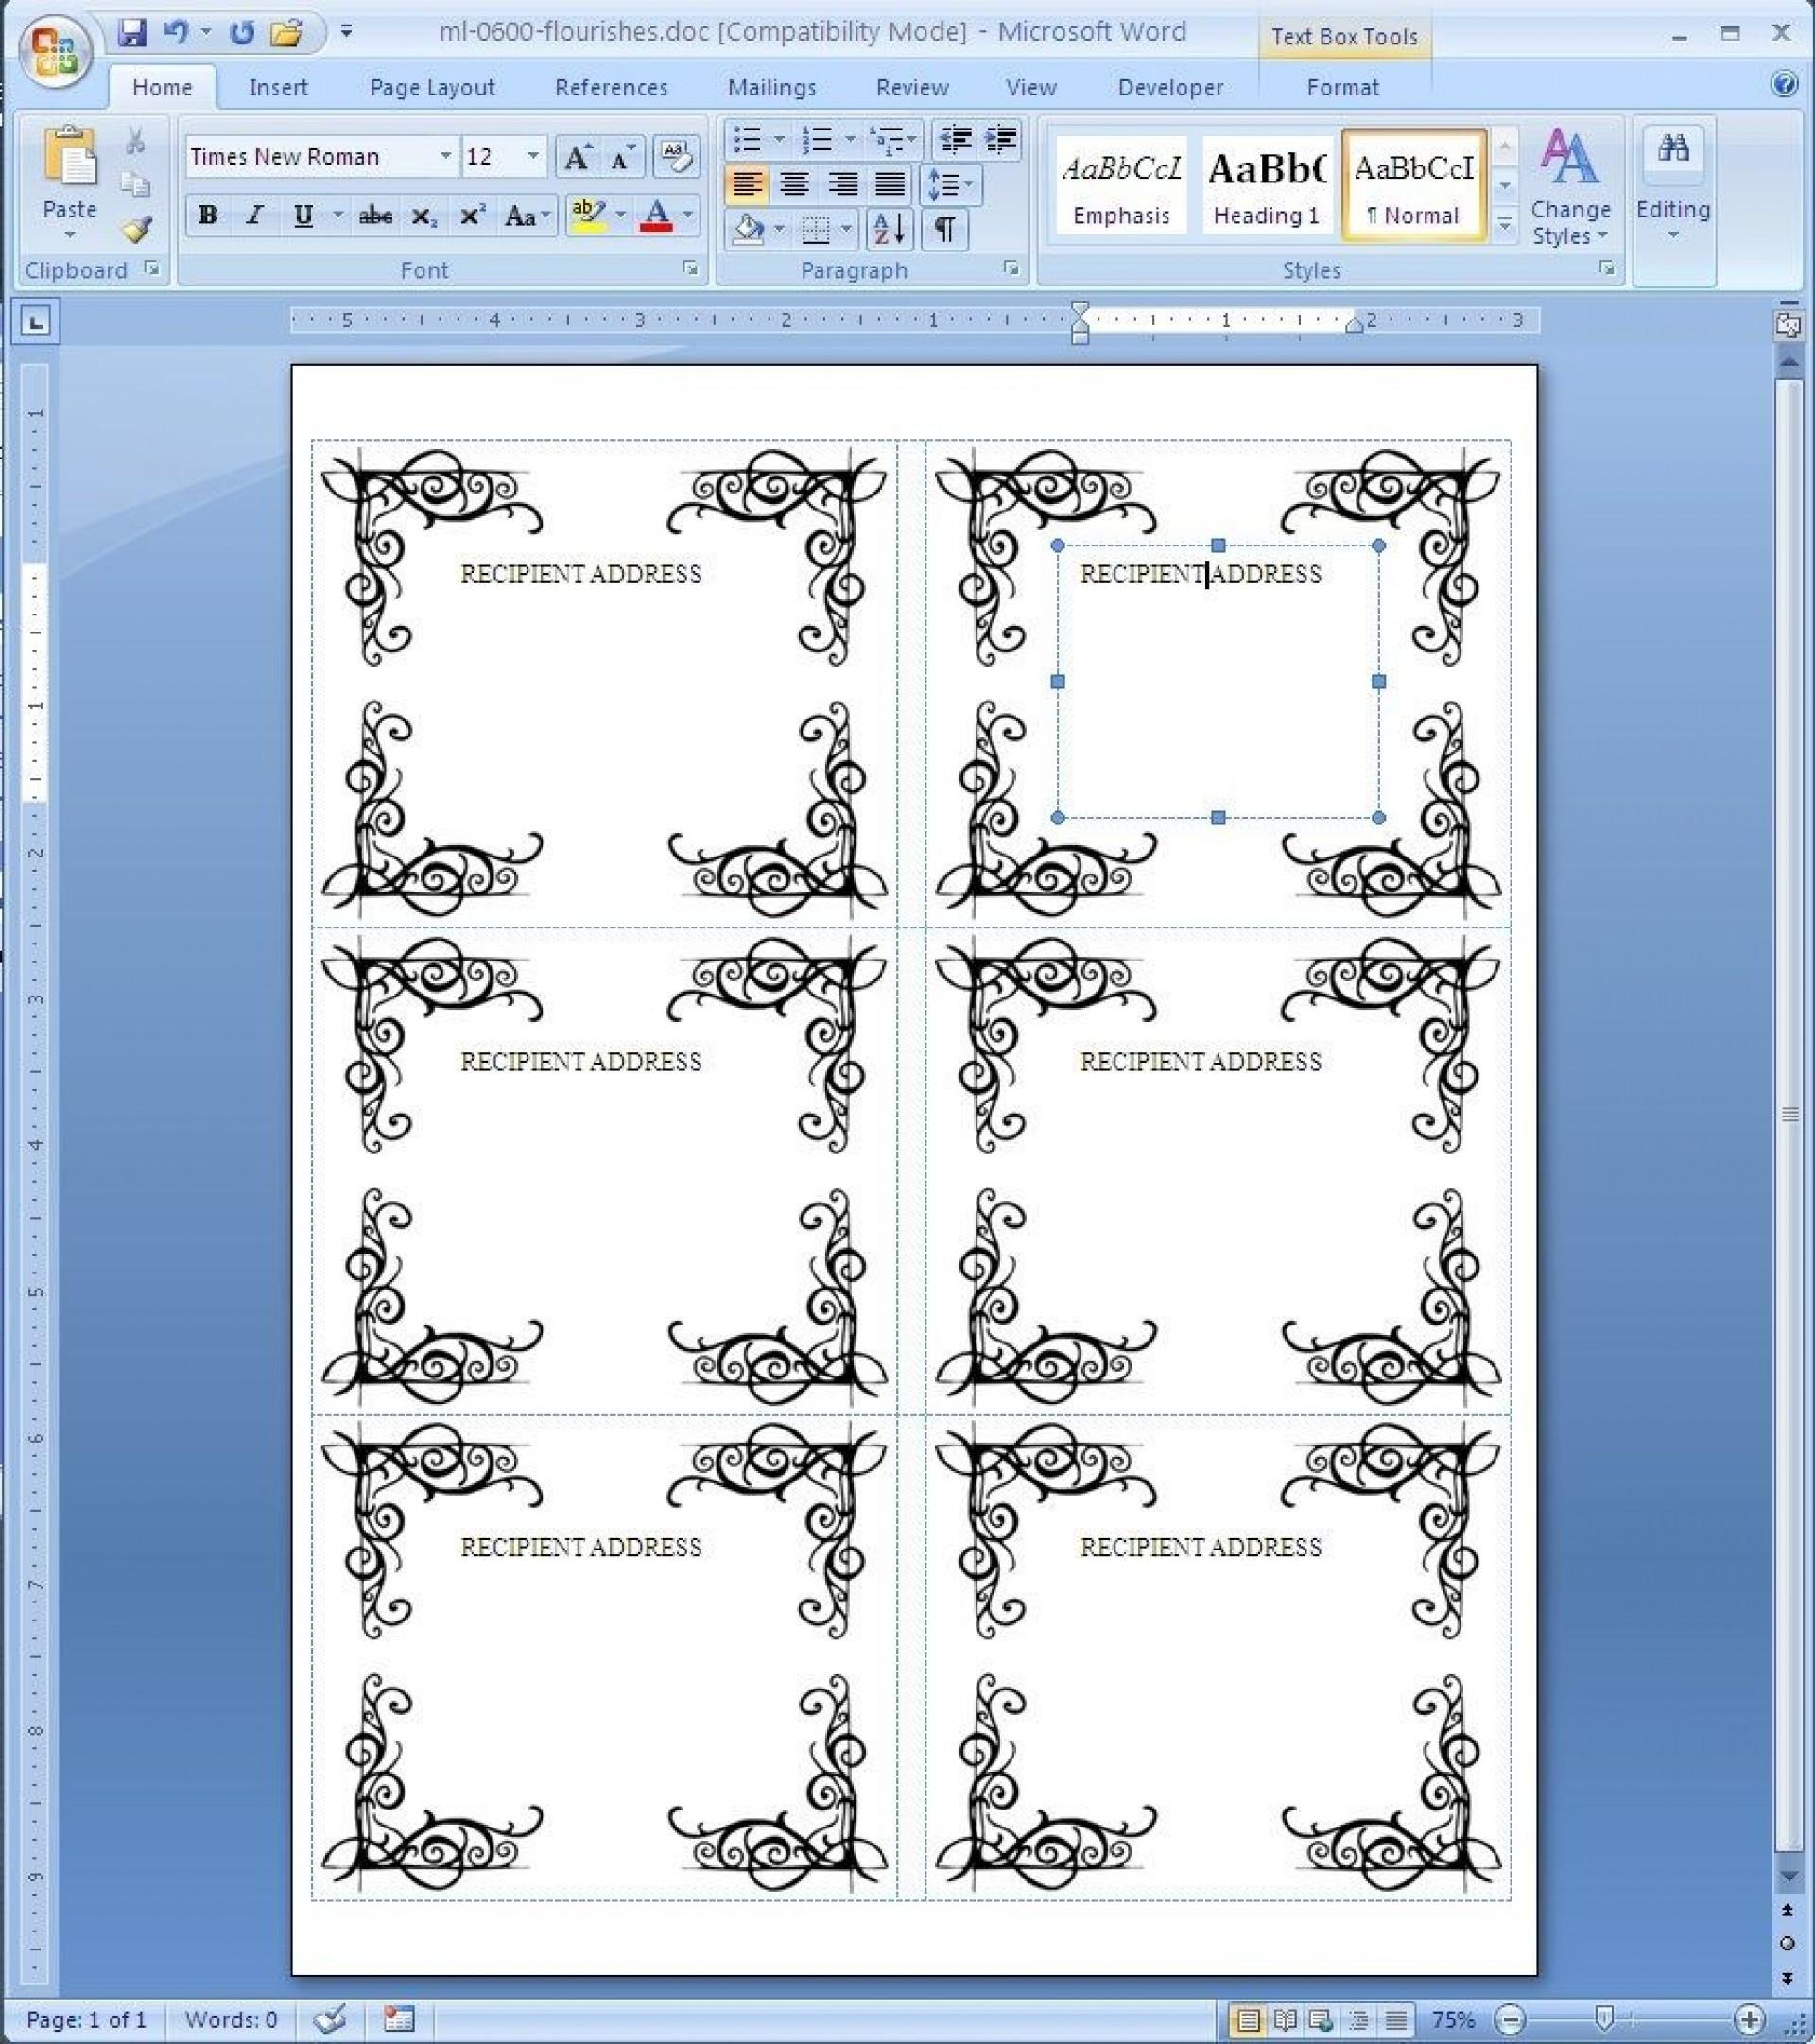 000 Wonderful Microsoft Word Label Template Sample  Templates 24 Per Sheet Addres 21 Free Download1920